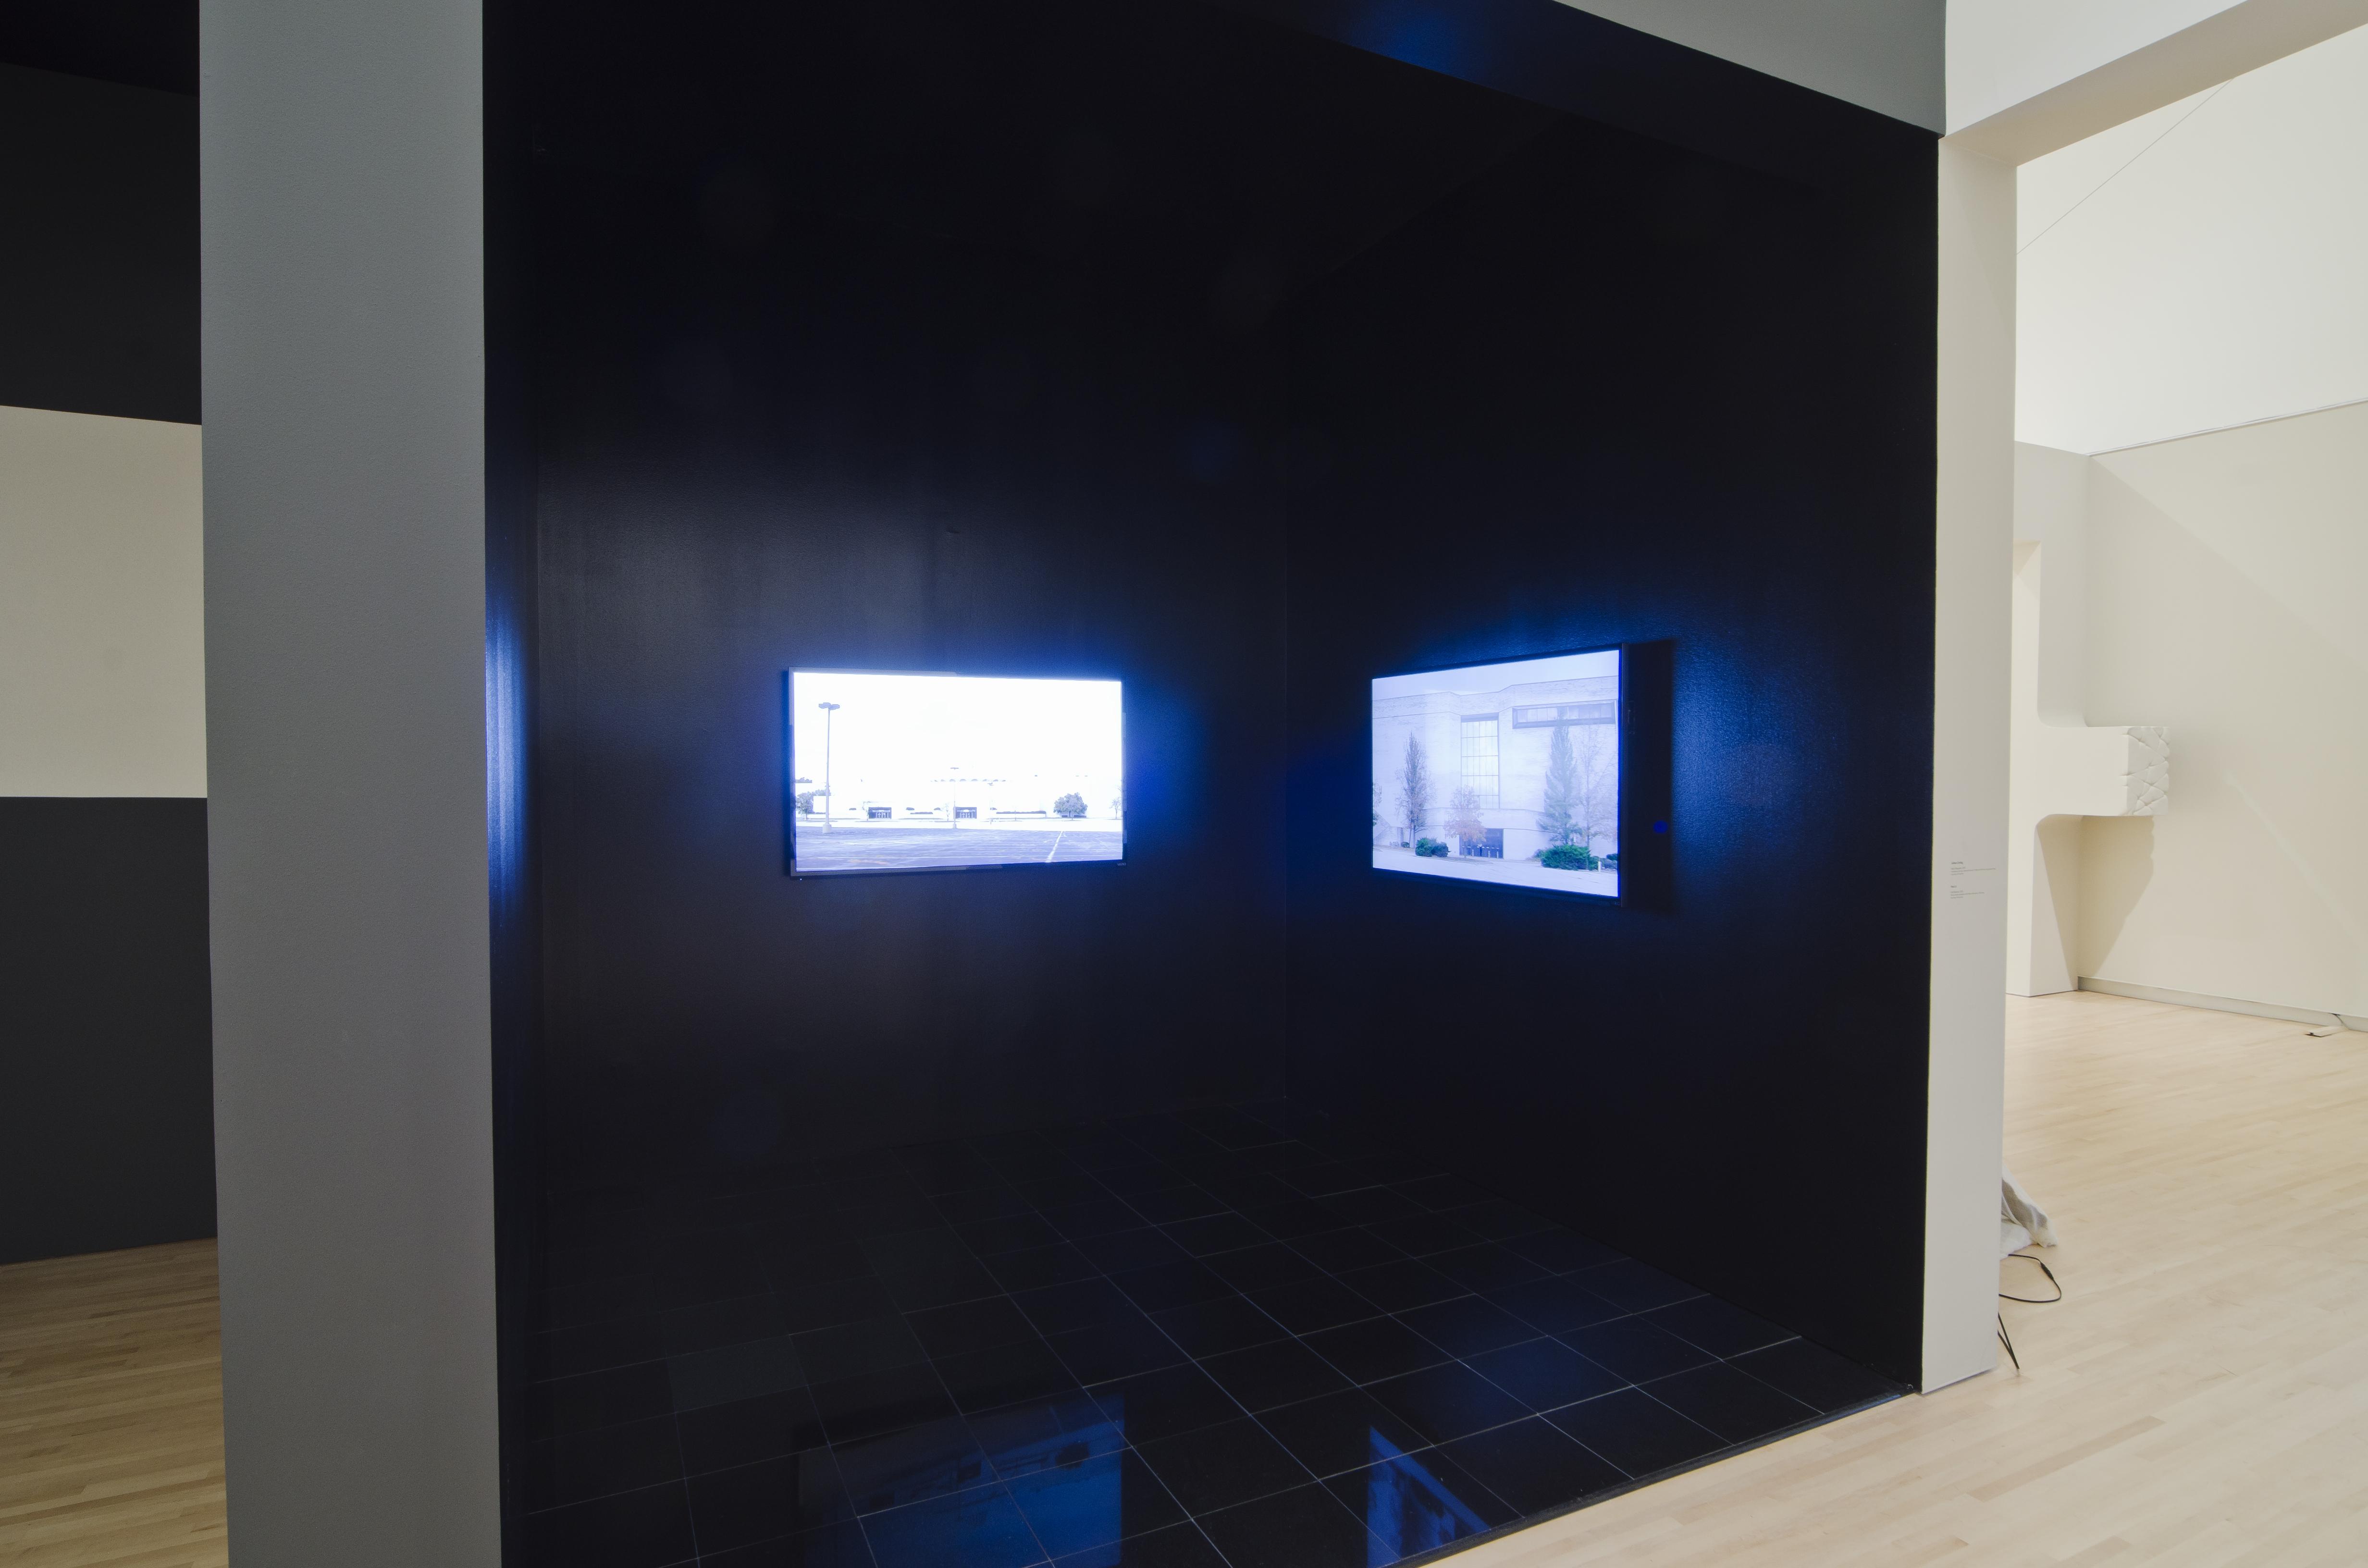 Retail Requiem by JaNae Contag at Mildred Kemper Lane Art Museum